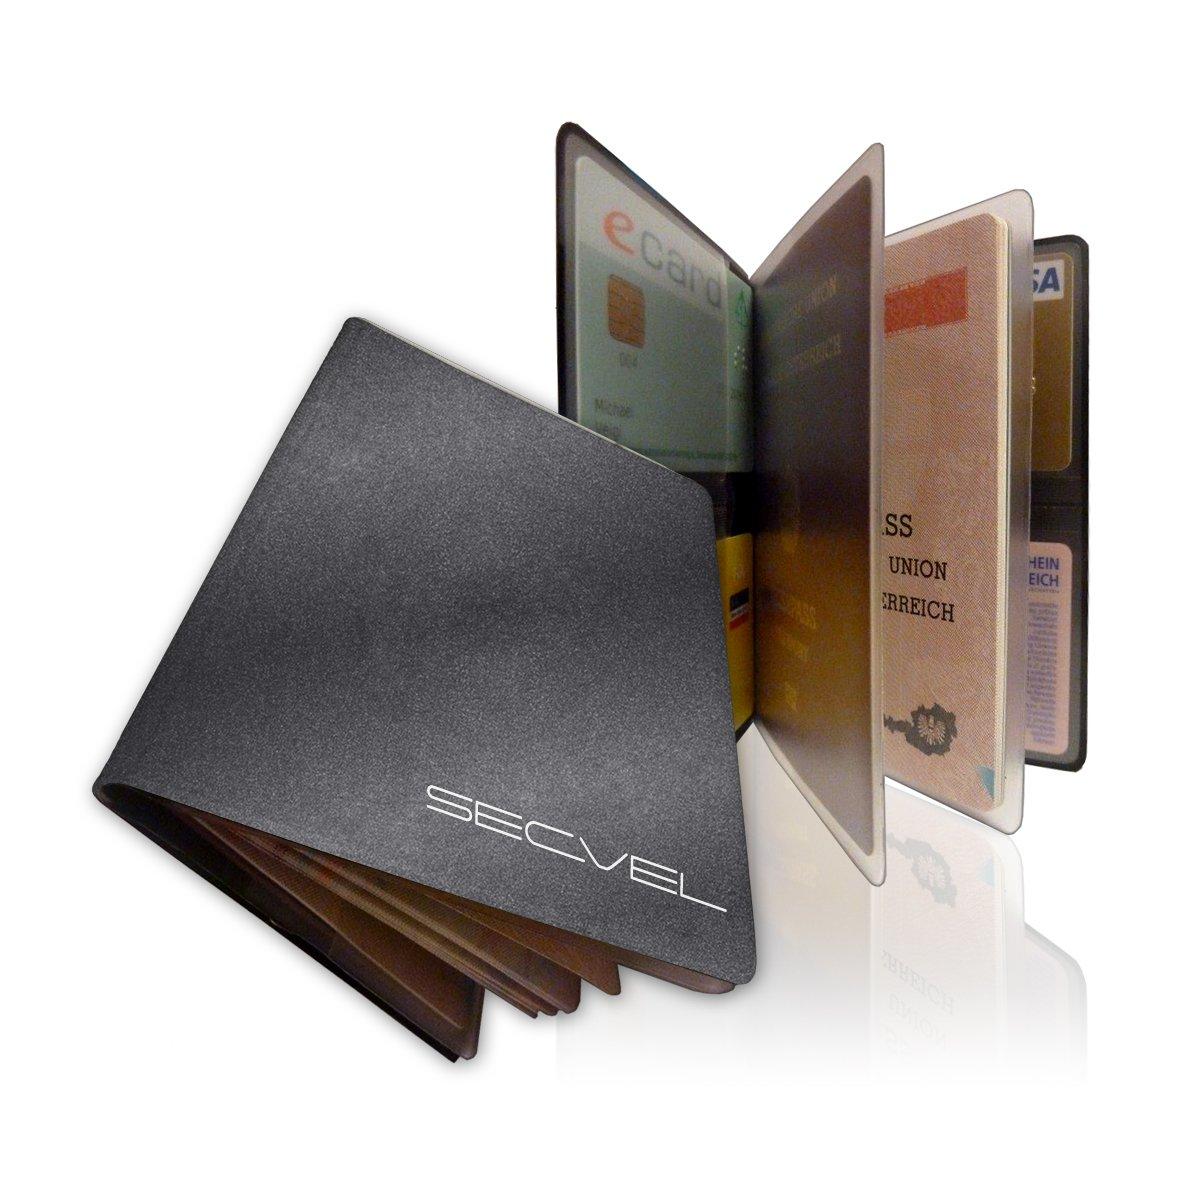 SECVEL Porta passaporto Premium � protezione RFID/NFC & campi magnetici (per 1 passaporto, 4 ca